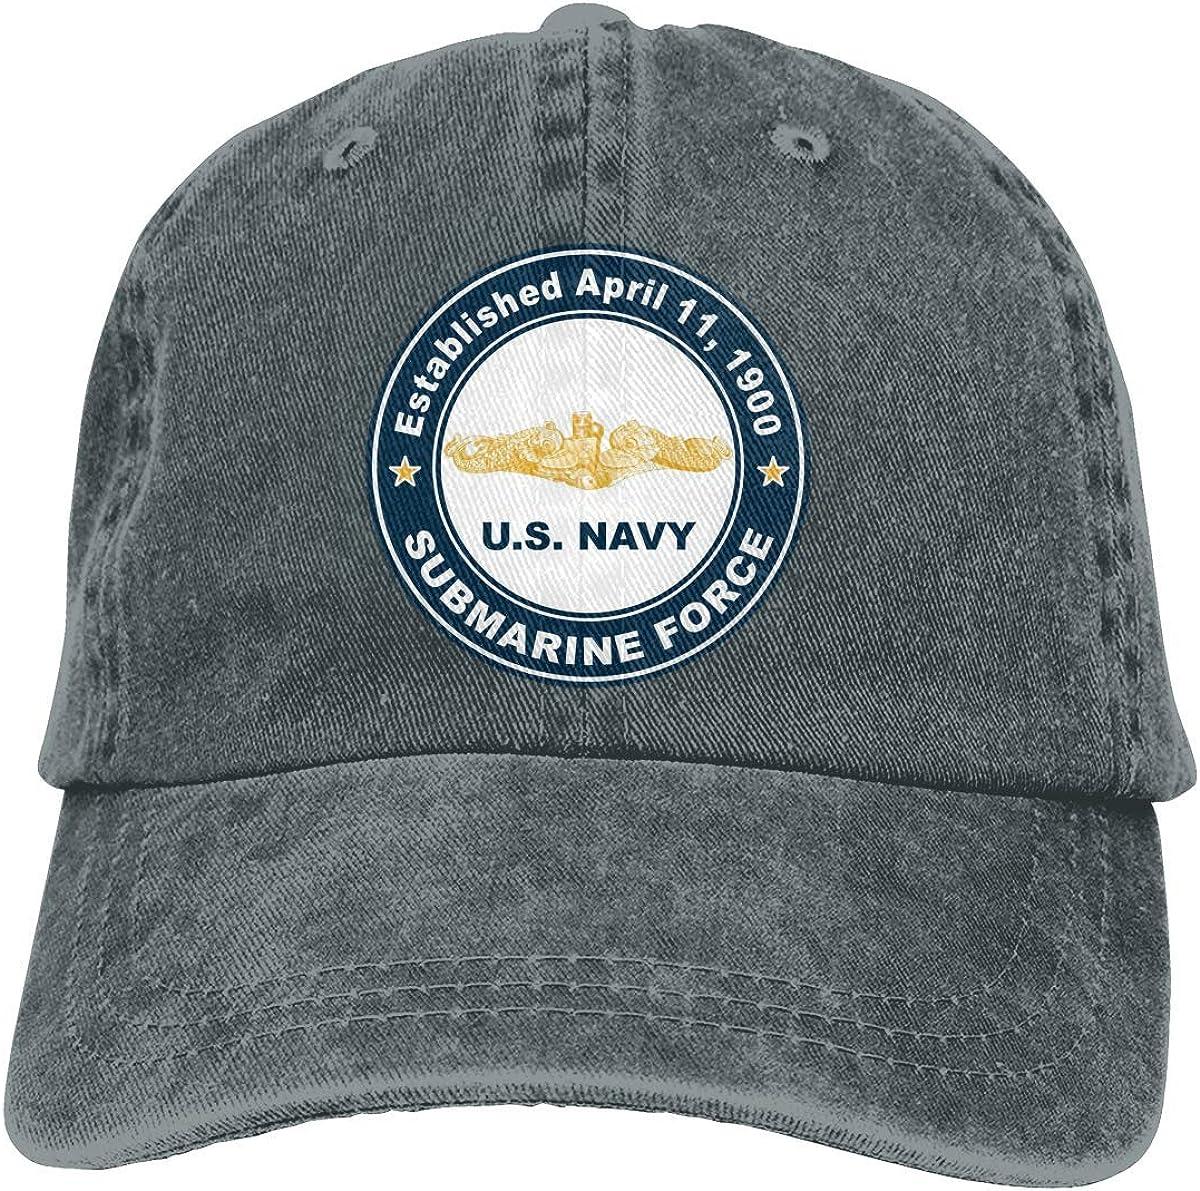 not applicable Armada de los EE. UU. Establecida el 11 de Abril de 1900 Submarine Force Gold Gorras de béisbol Ajustables Sombreros de Mezclilla Cowboy Sport Outdoor